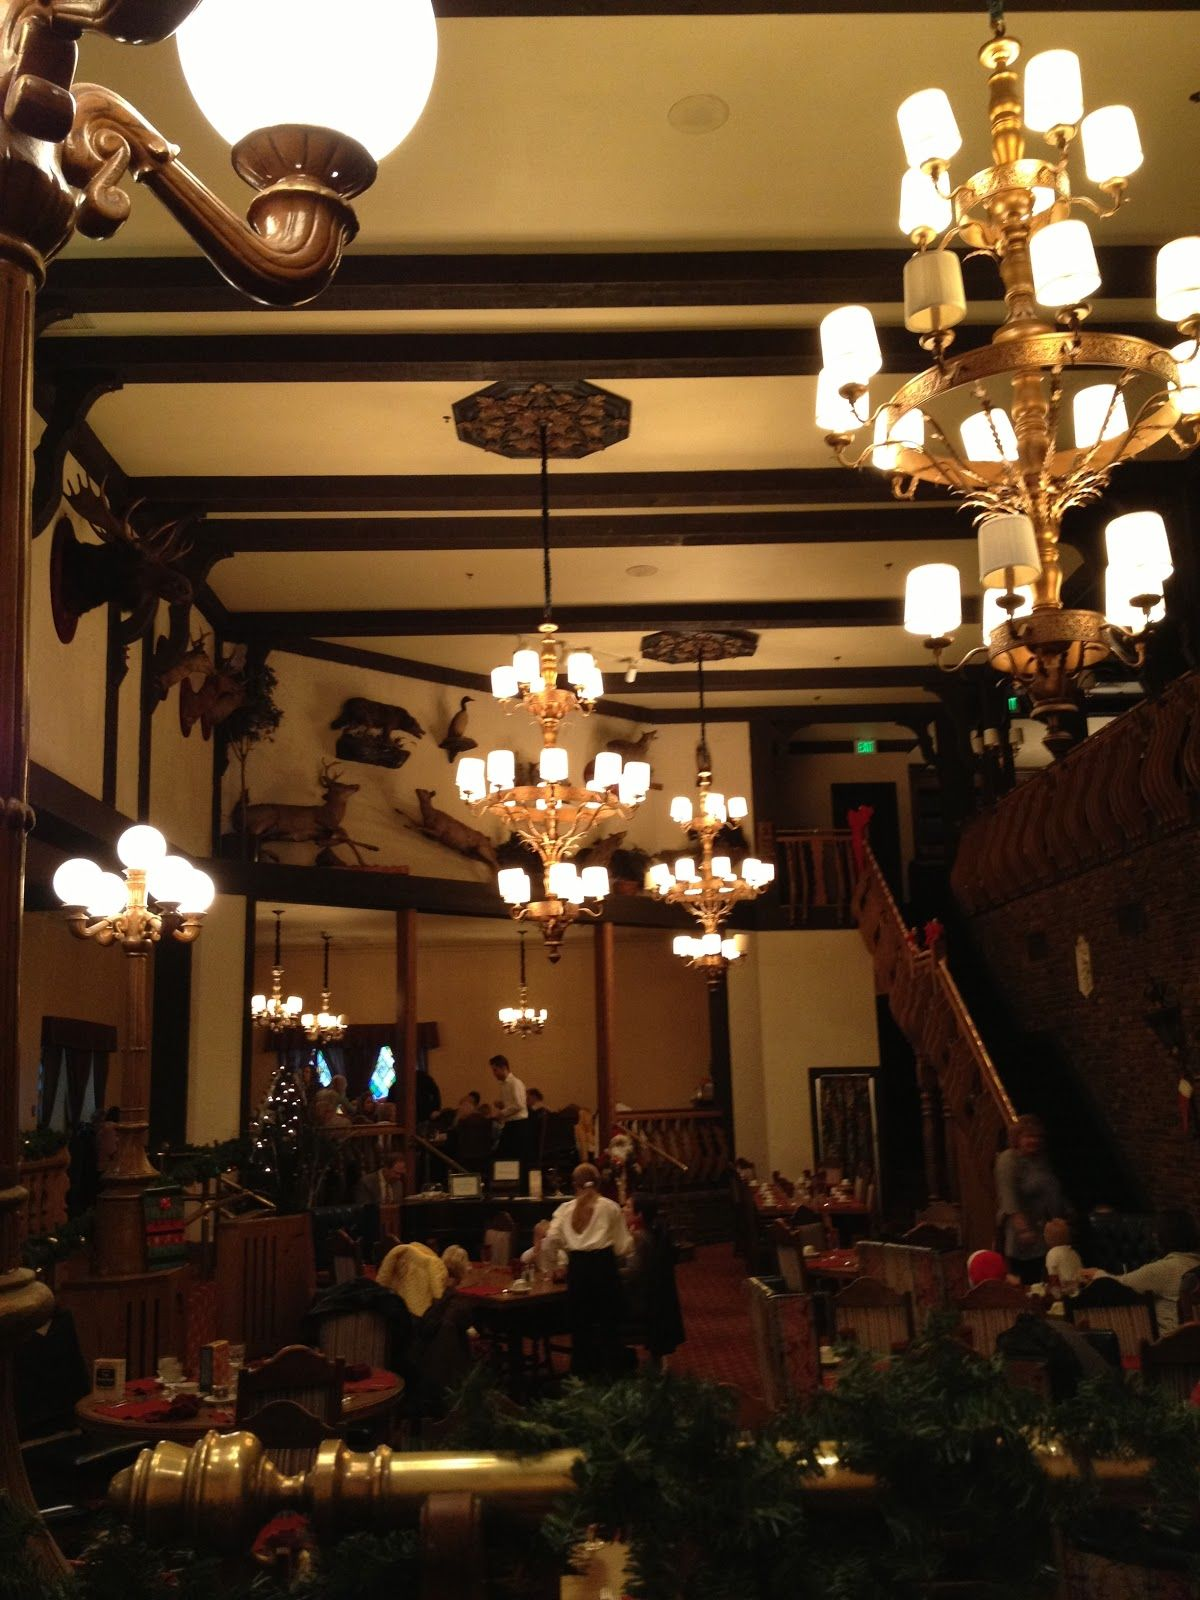 Bucket List Reviews Hotels The Lodge Hotel Bettendorf Iowa